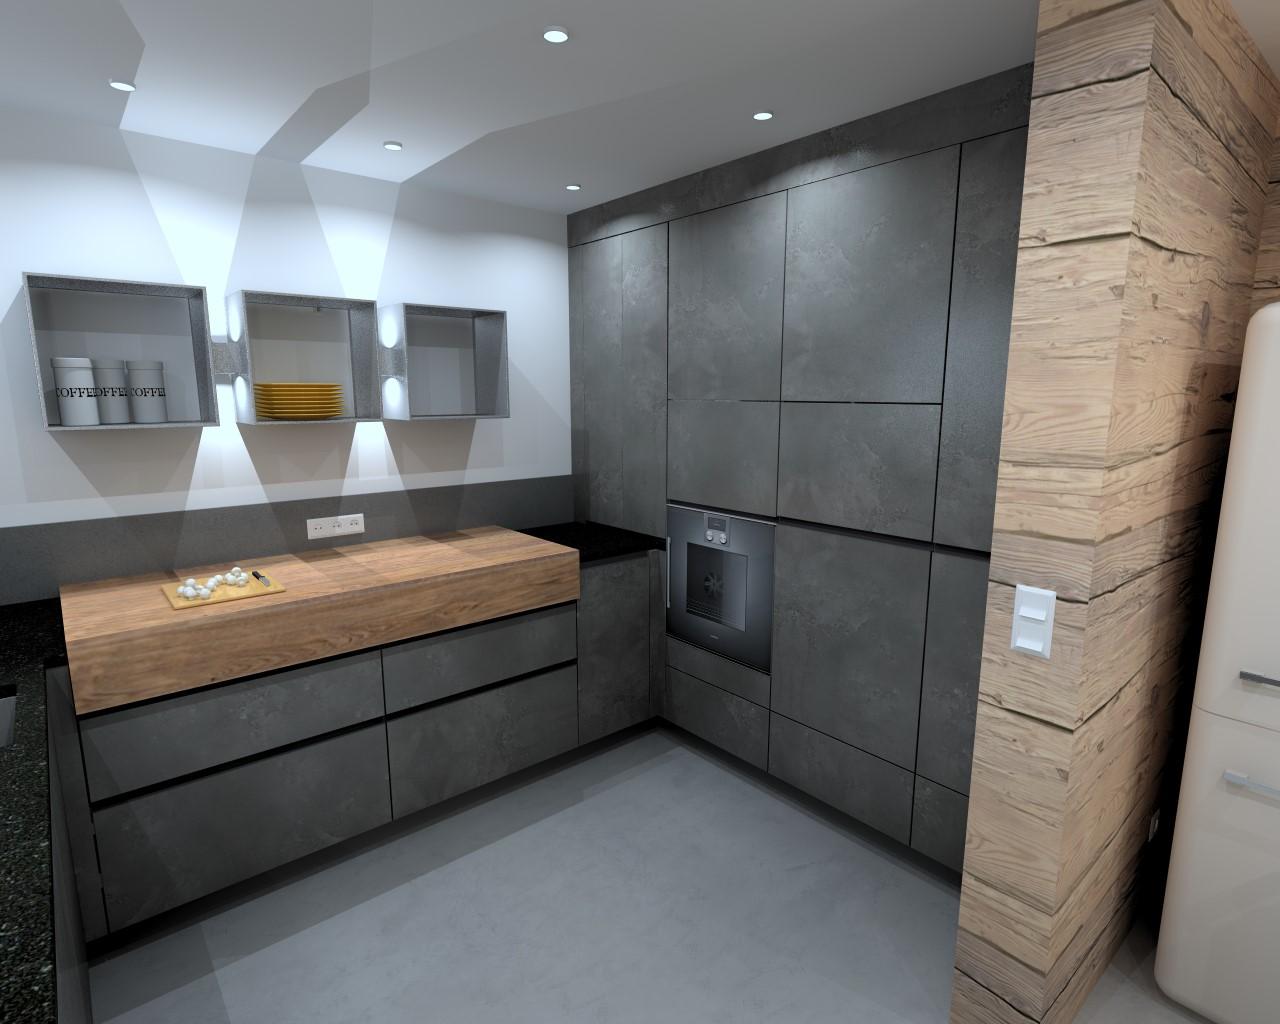 Outdoor Küche Aus Hobelbank : Kuchenwerkstatt amberg hobelbank u003eu003e 20 beaufiful hobelbank küche